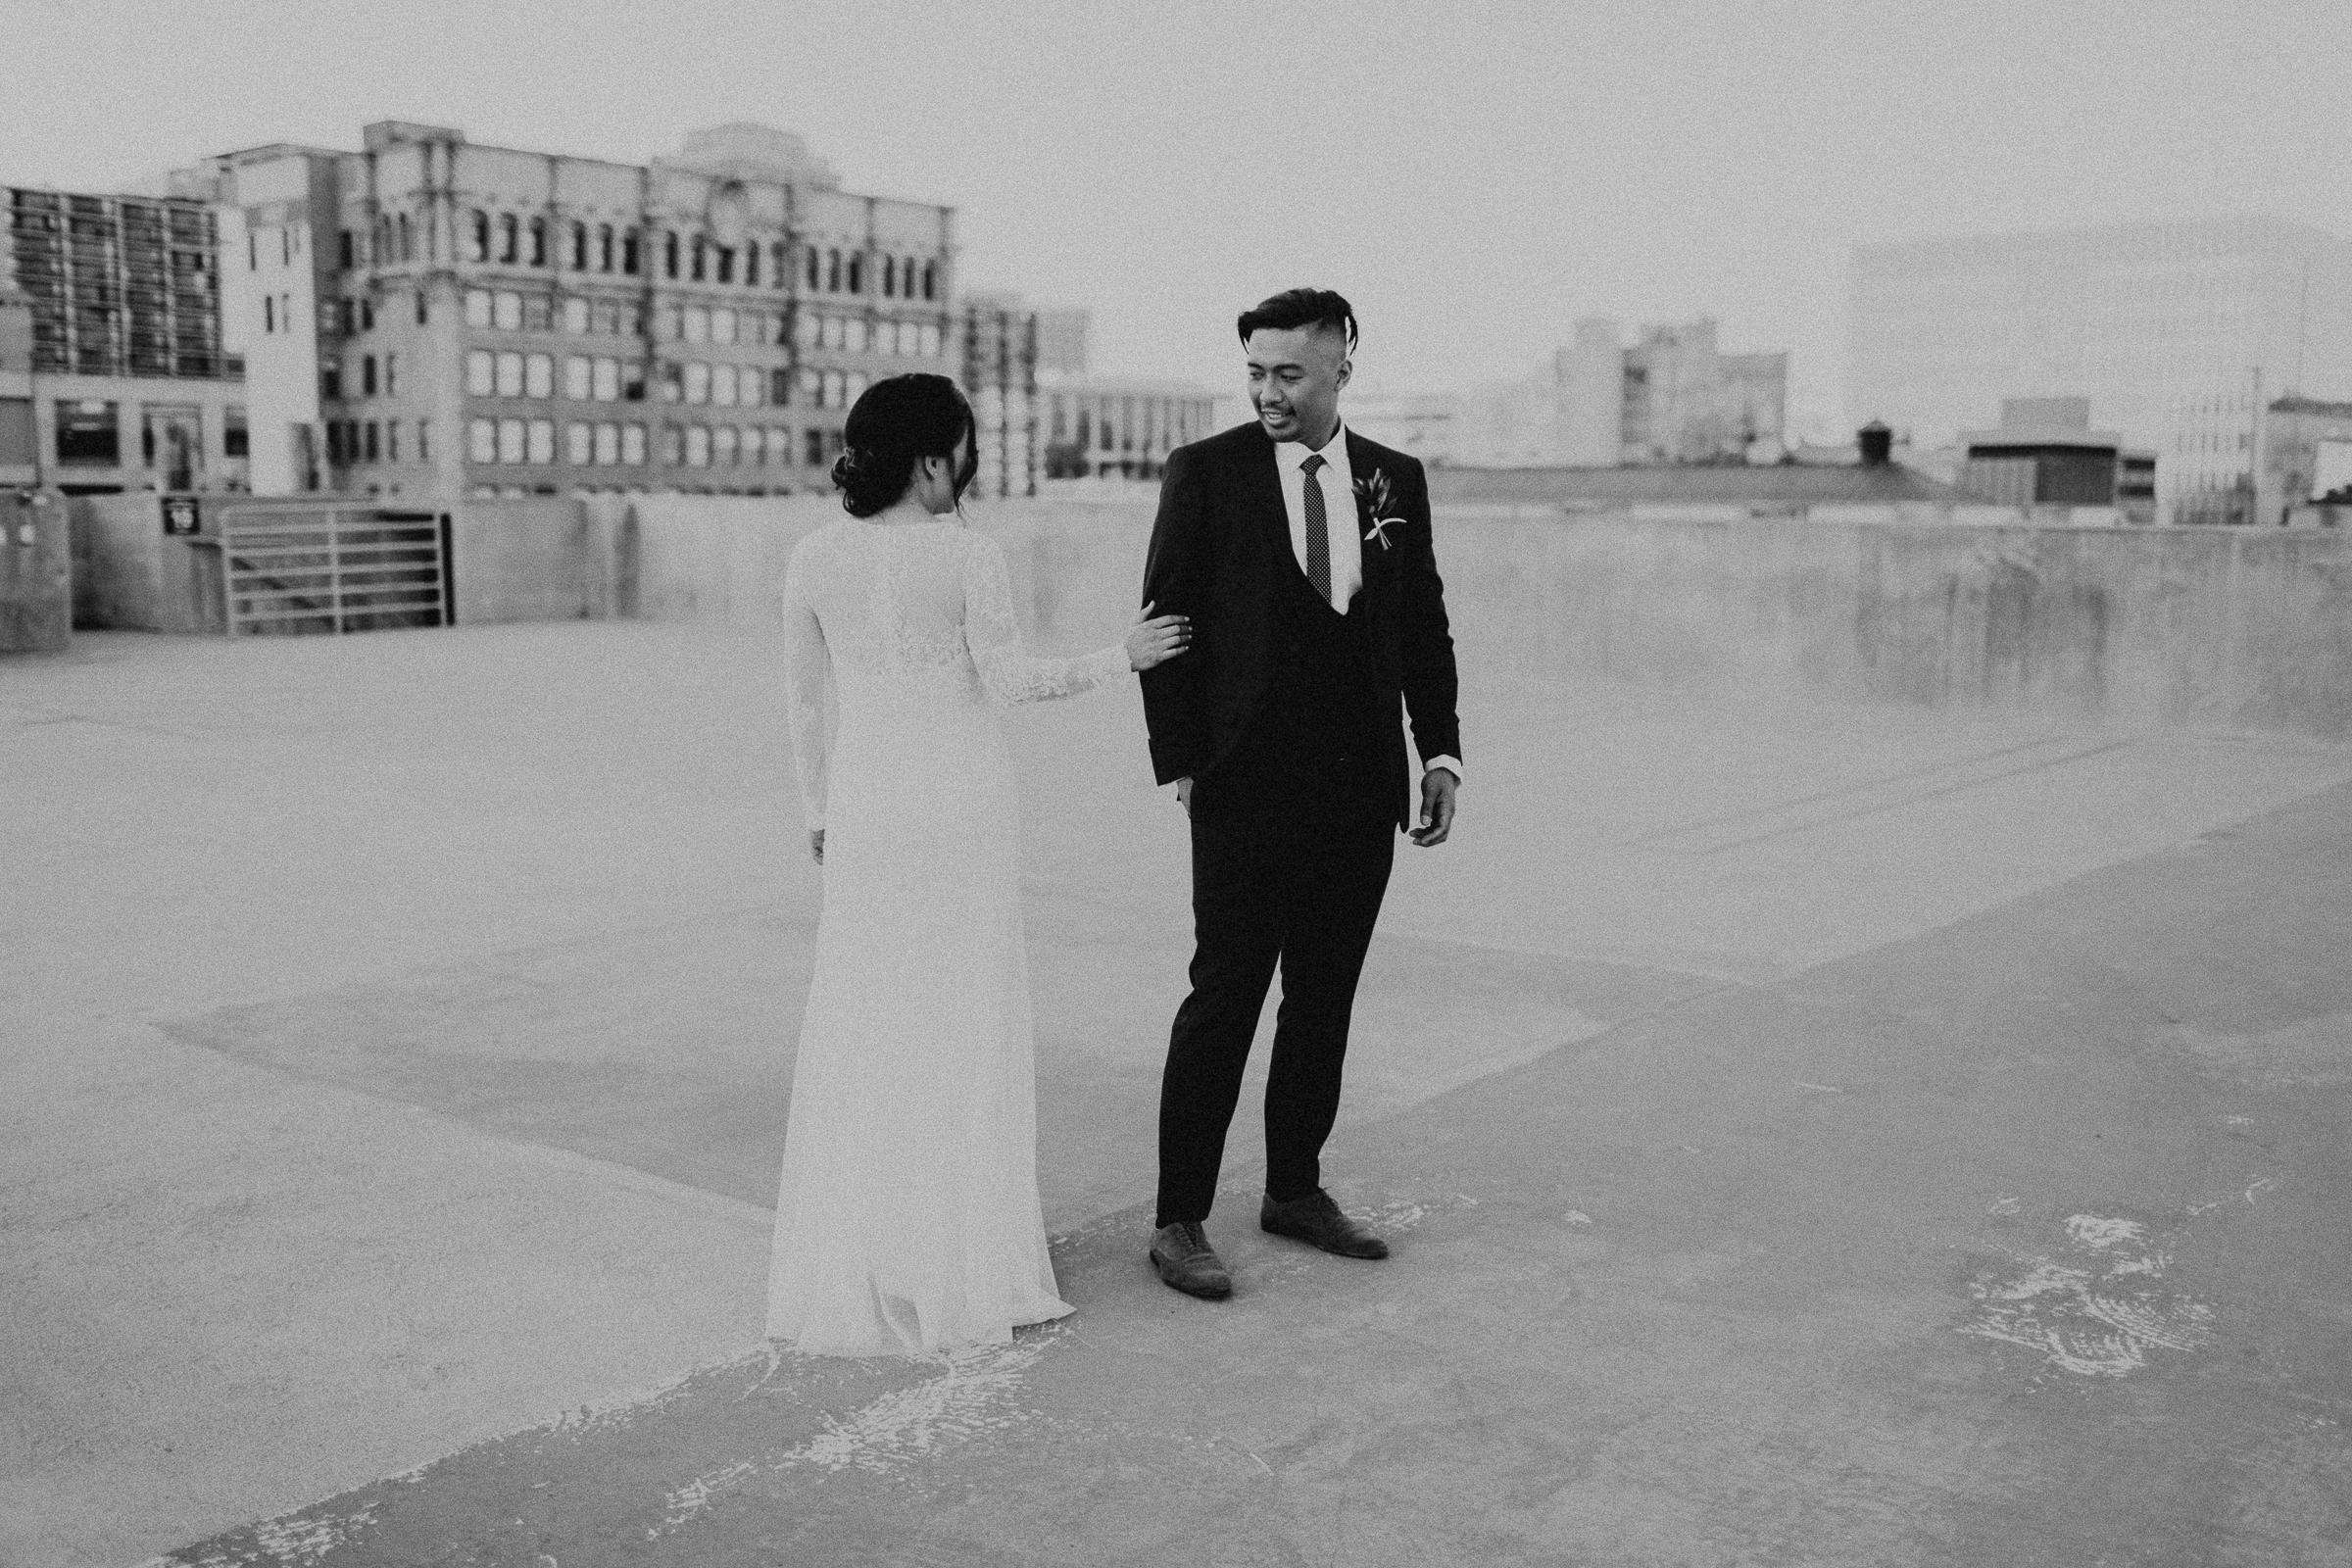 gretchen_gause_san_francisco_wedding_photo-28.jpg